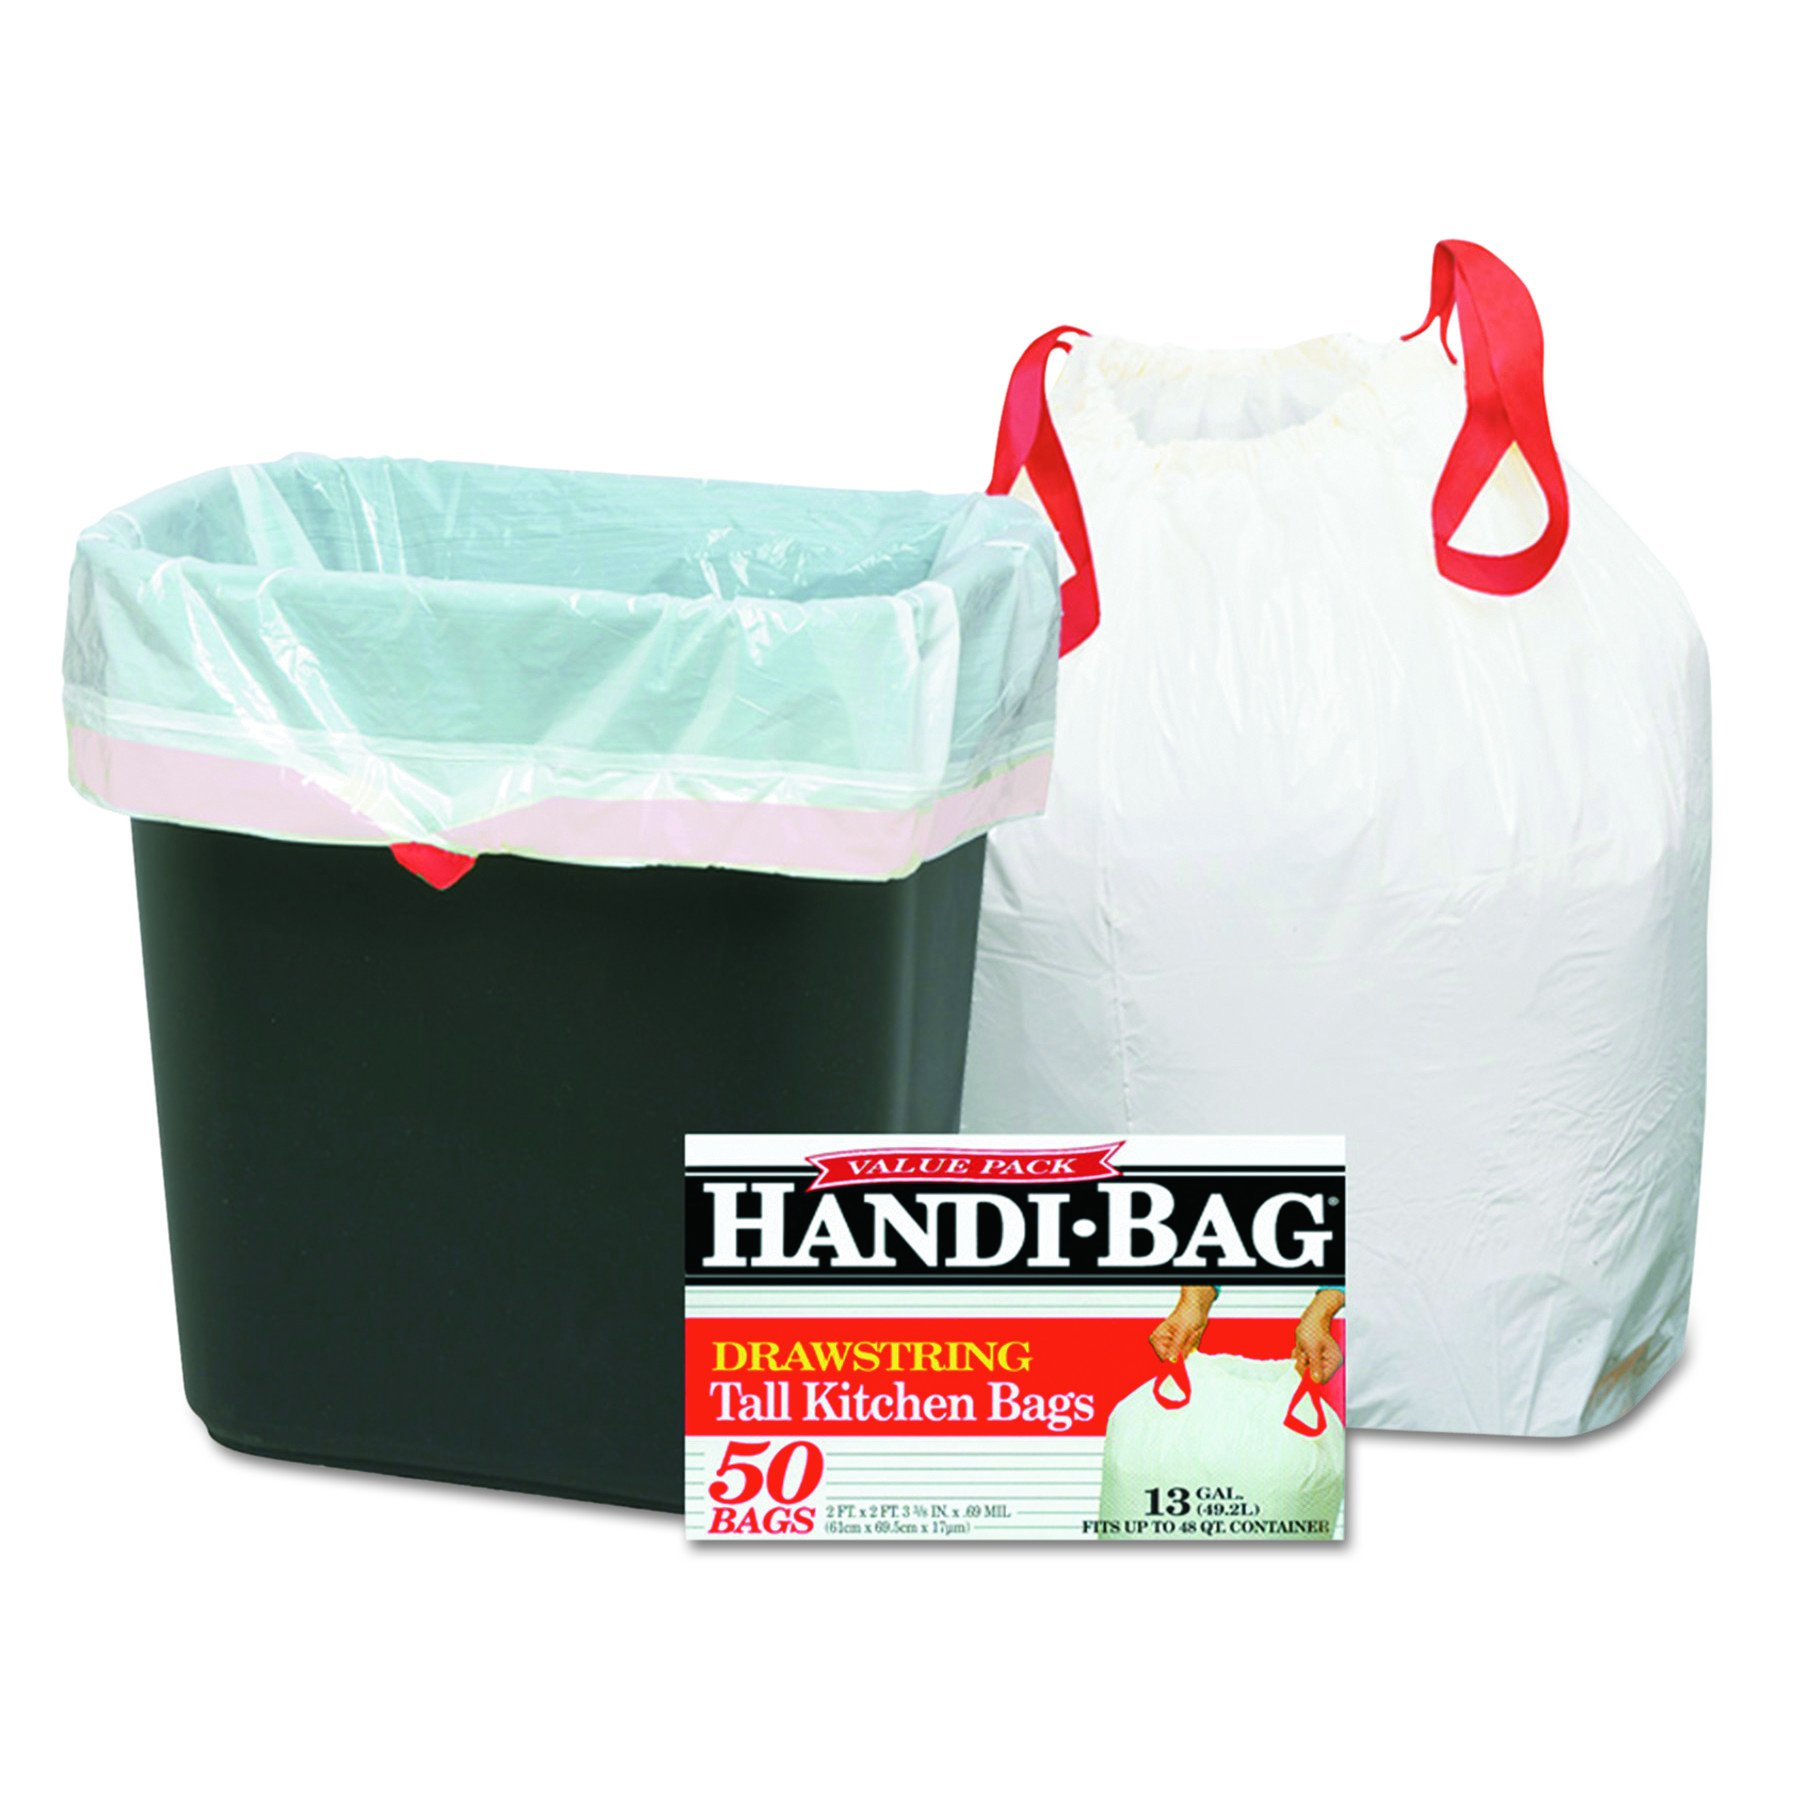 Handi-Bag drawstring tall kitchen bags, 13 Gallon, 61cm*69.5cm, 50/Box